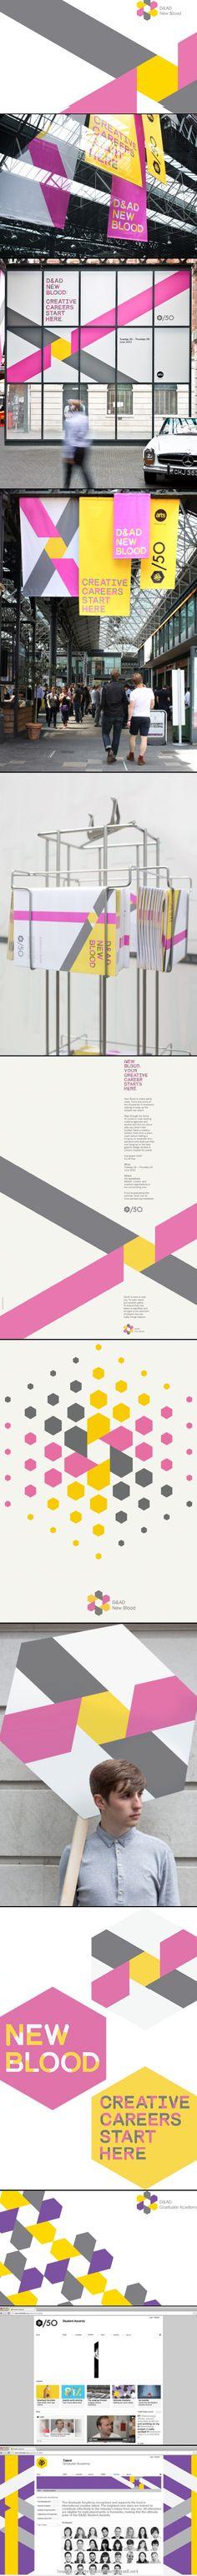 Identity / d&ad  ihnynotes: color pops                                                                                                                                                                                 More